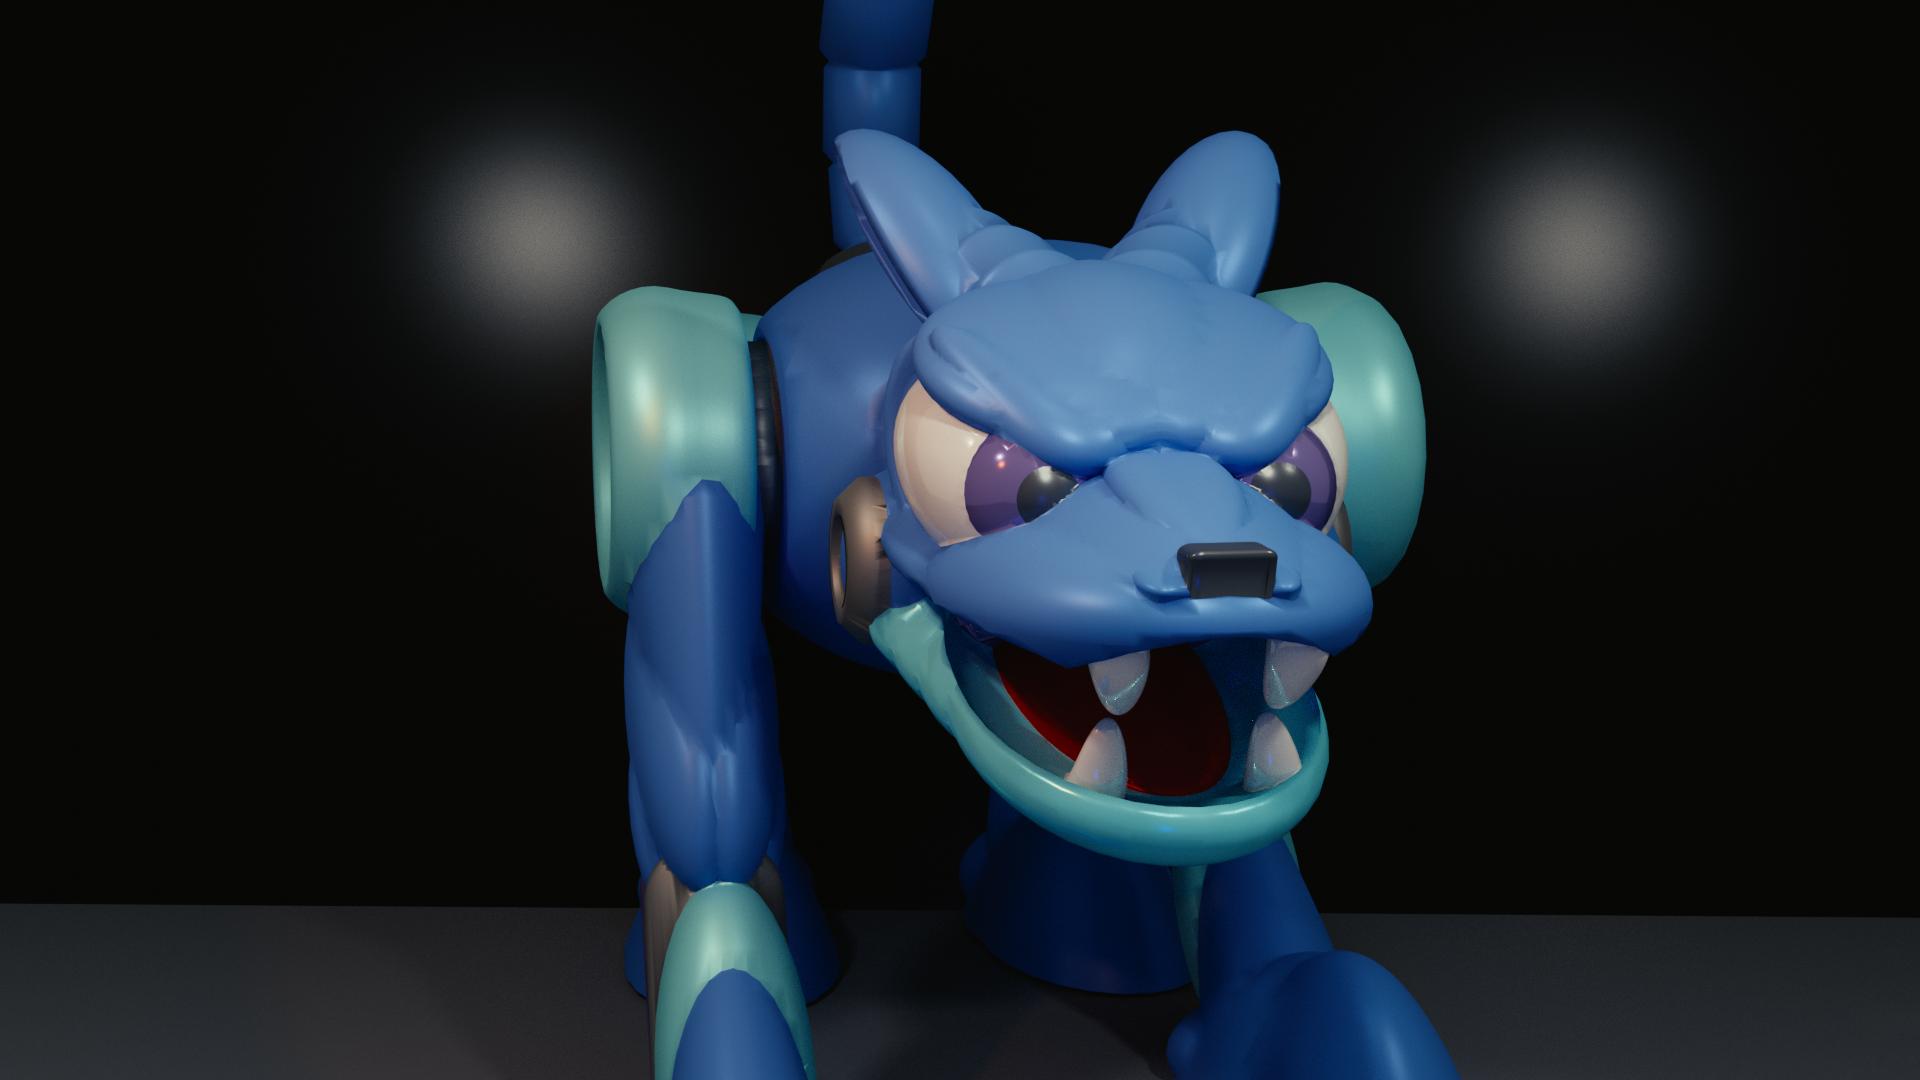 dognew1.png Download free STL file HOT DOG from MEGAMAN 2 • Design to 3D print, LittleTup